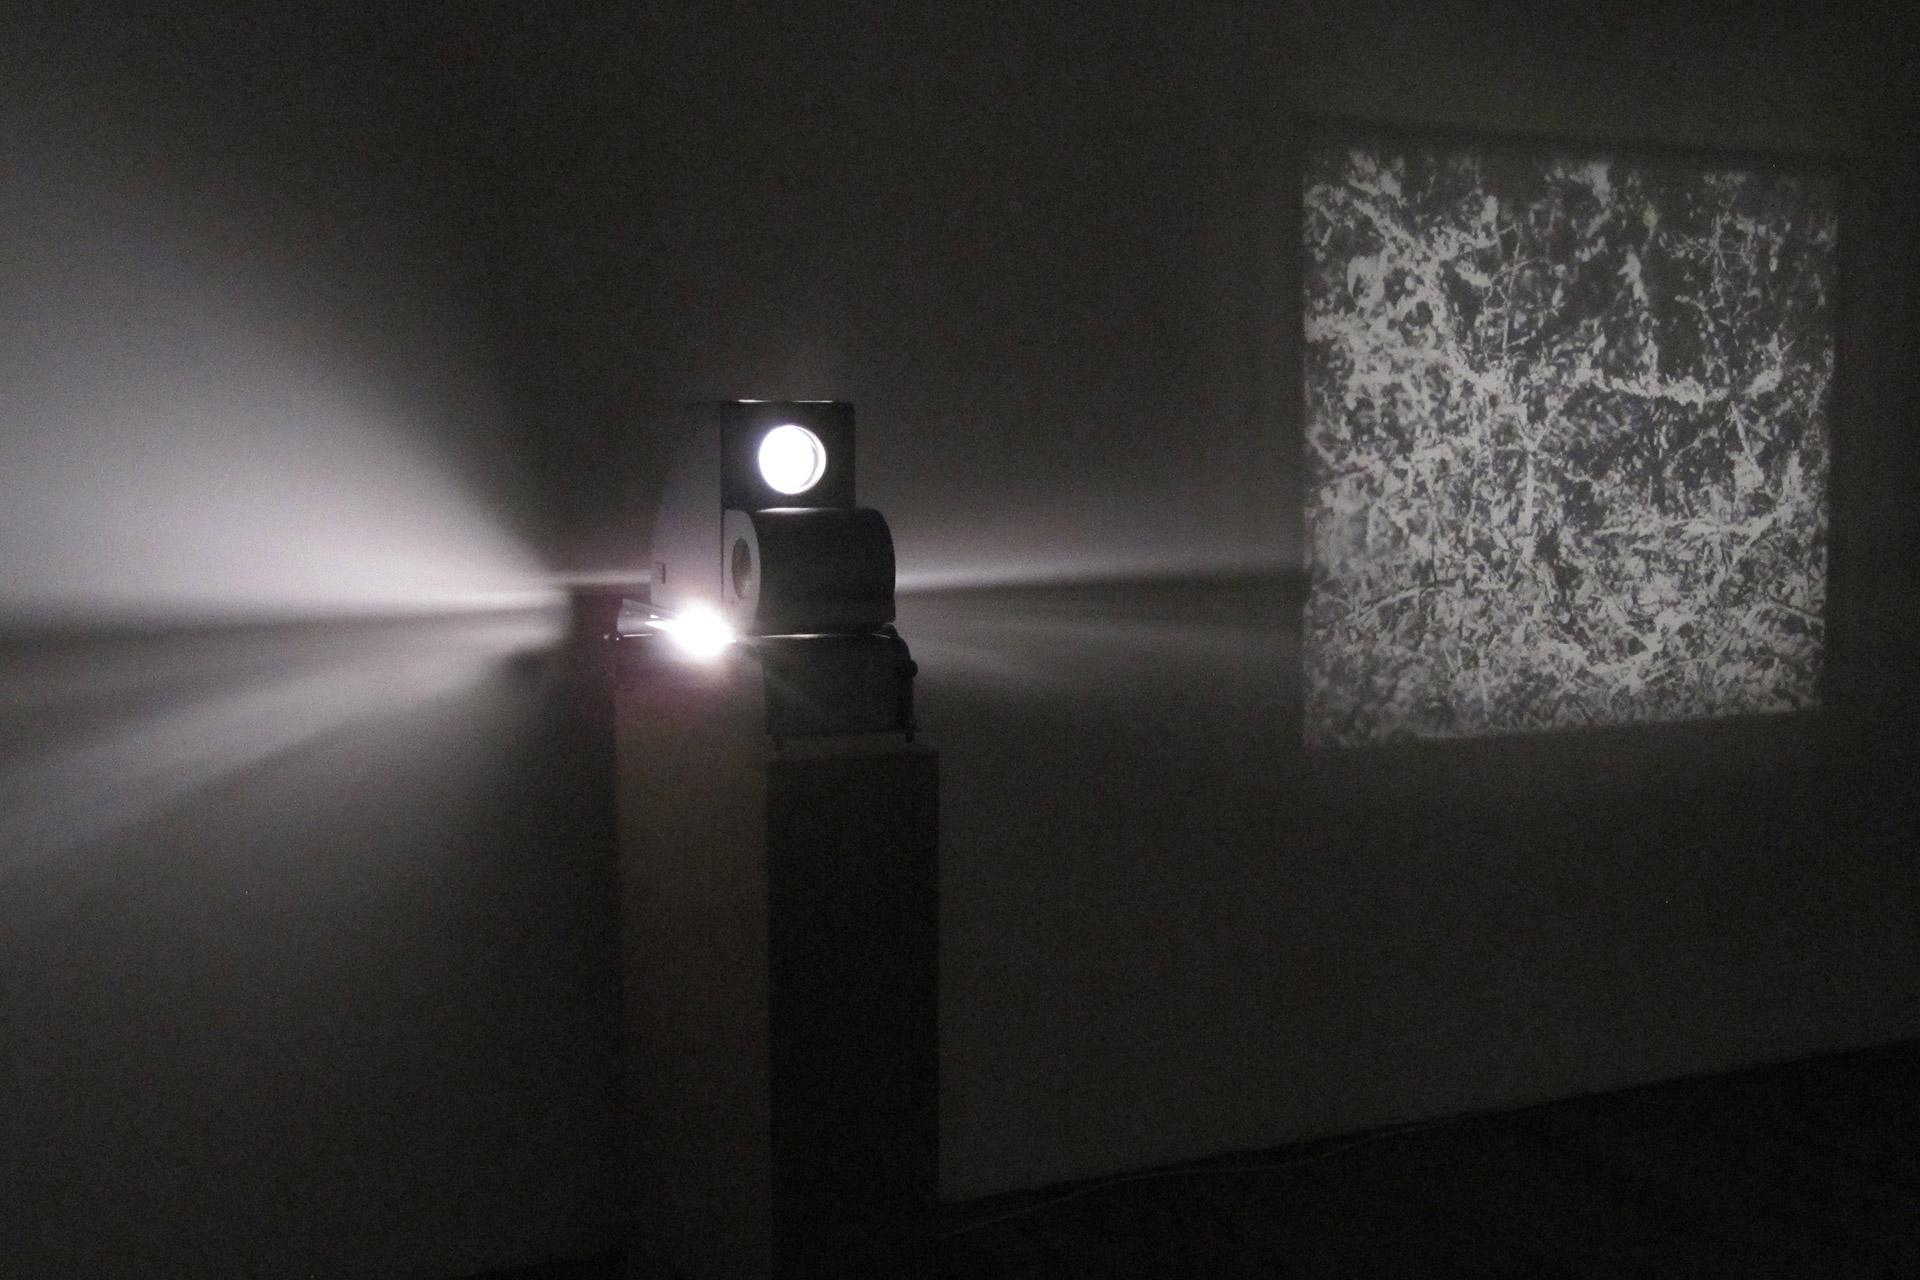 Susanne-Kriemann-Kunsthalle-Winterthur-2011-1.jpg